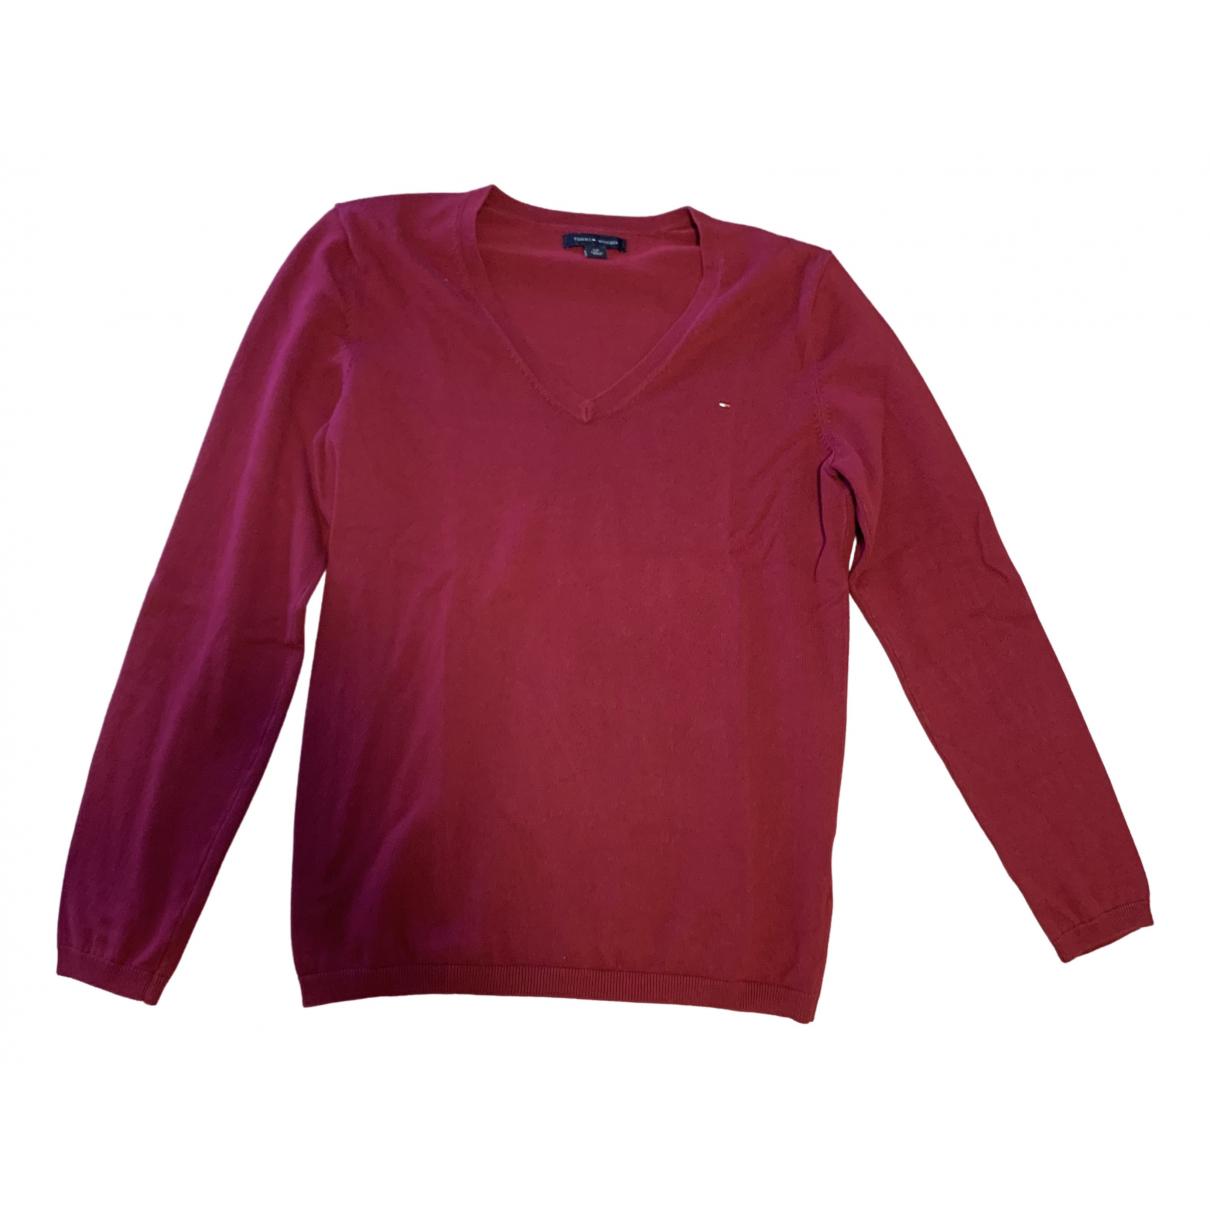 Tommy Hilfiger \N Pink Cotton Knitwear for Women S International